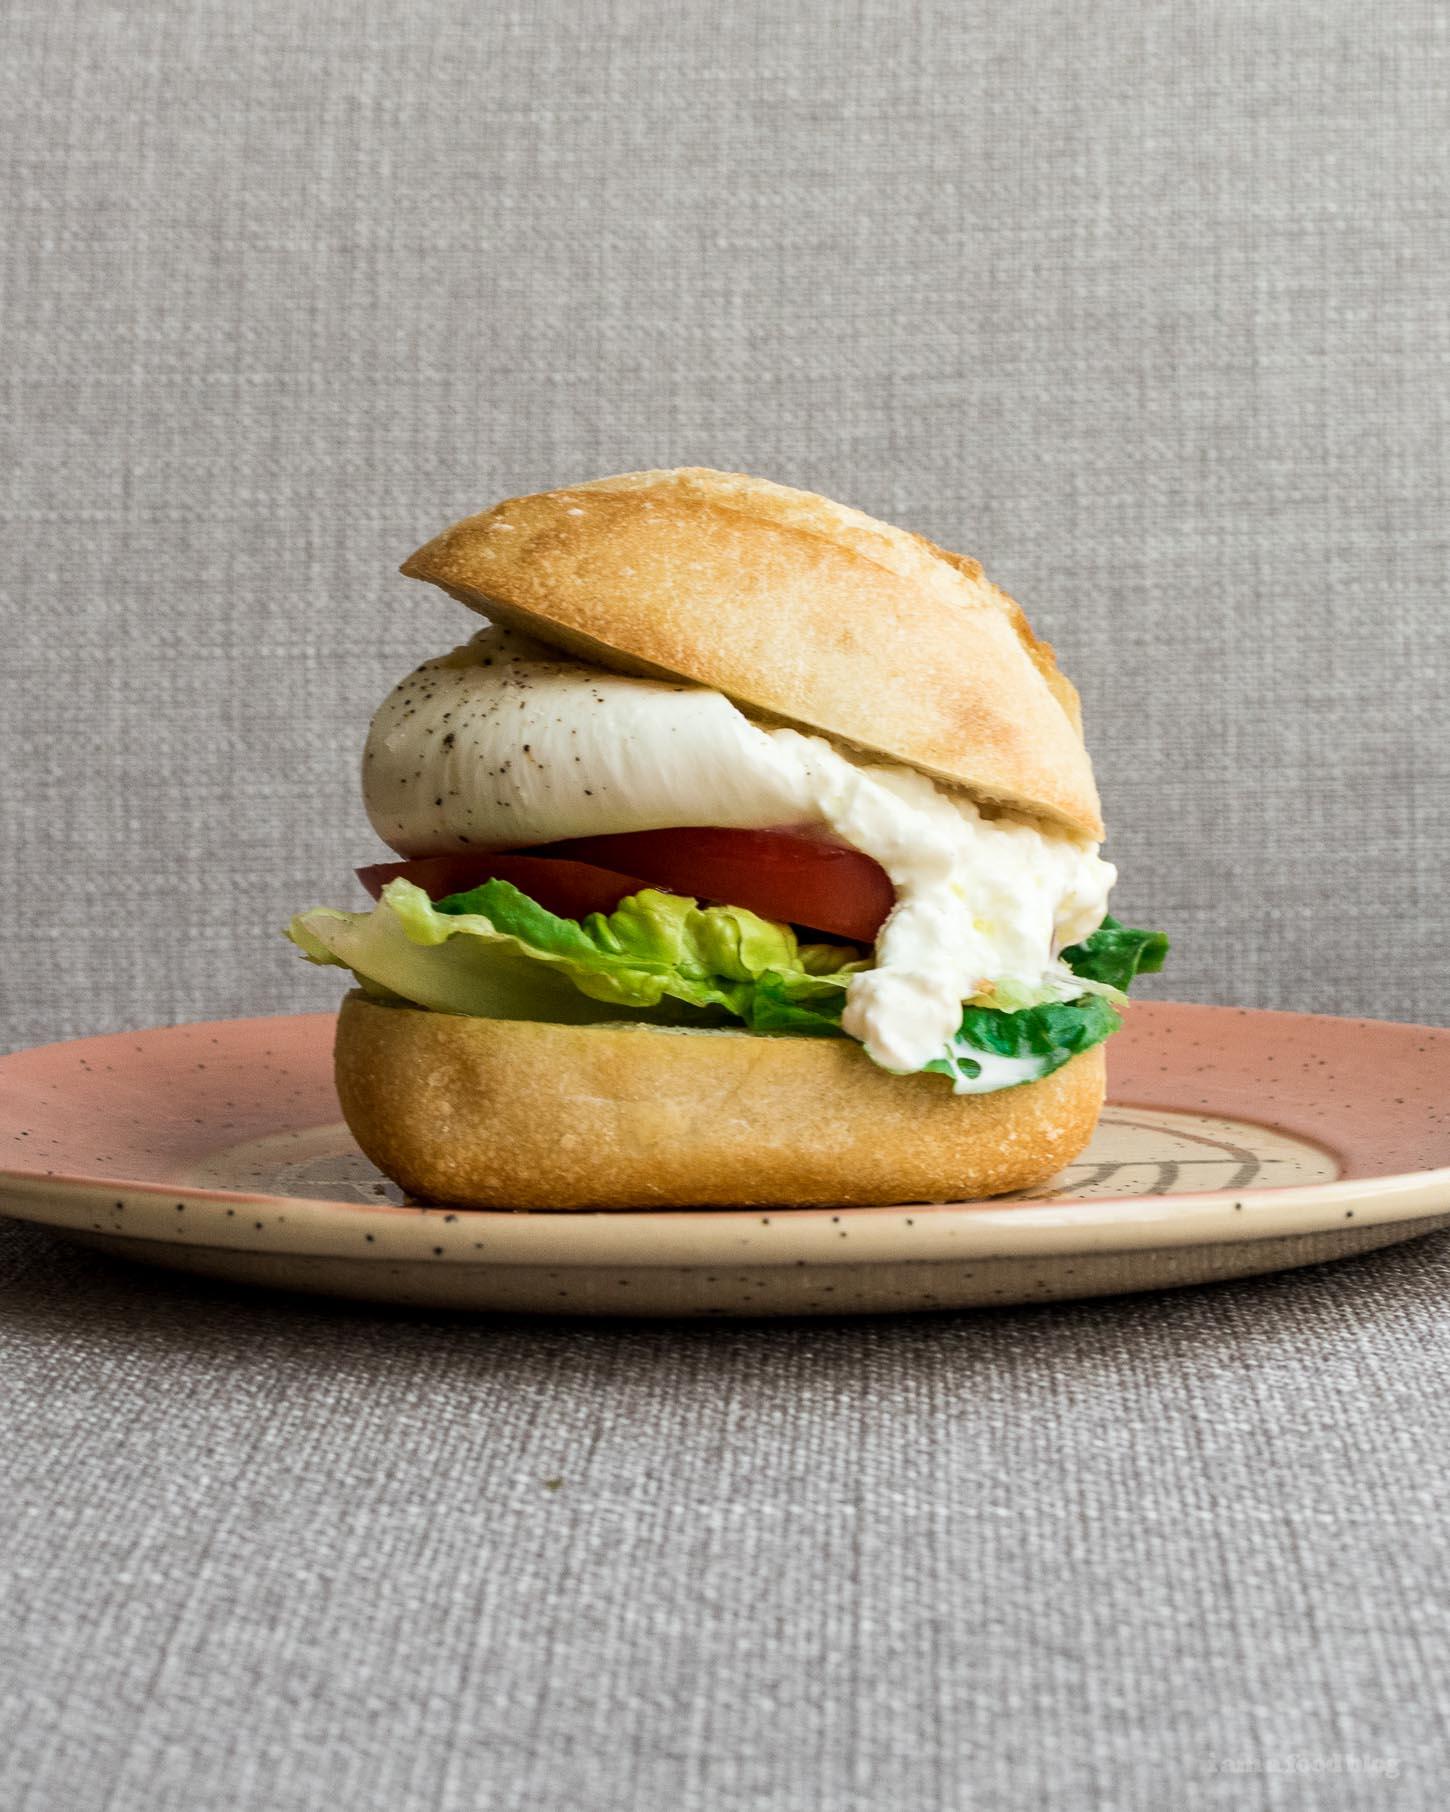 BLT Burrata, Lettuce, and Tomato Sandwich | www.iamafoodblog.com